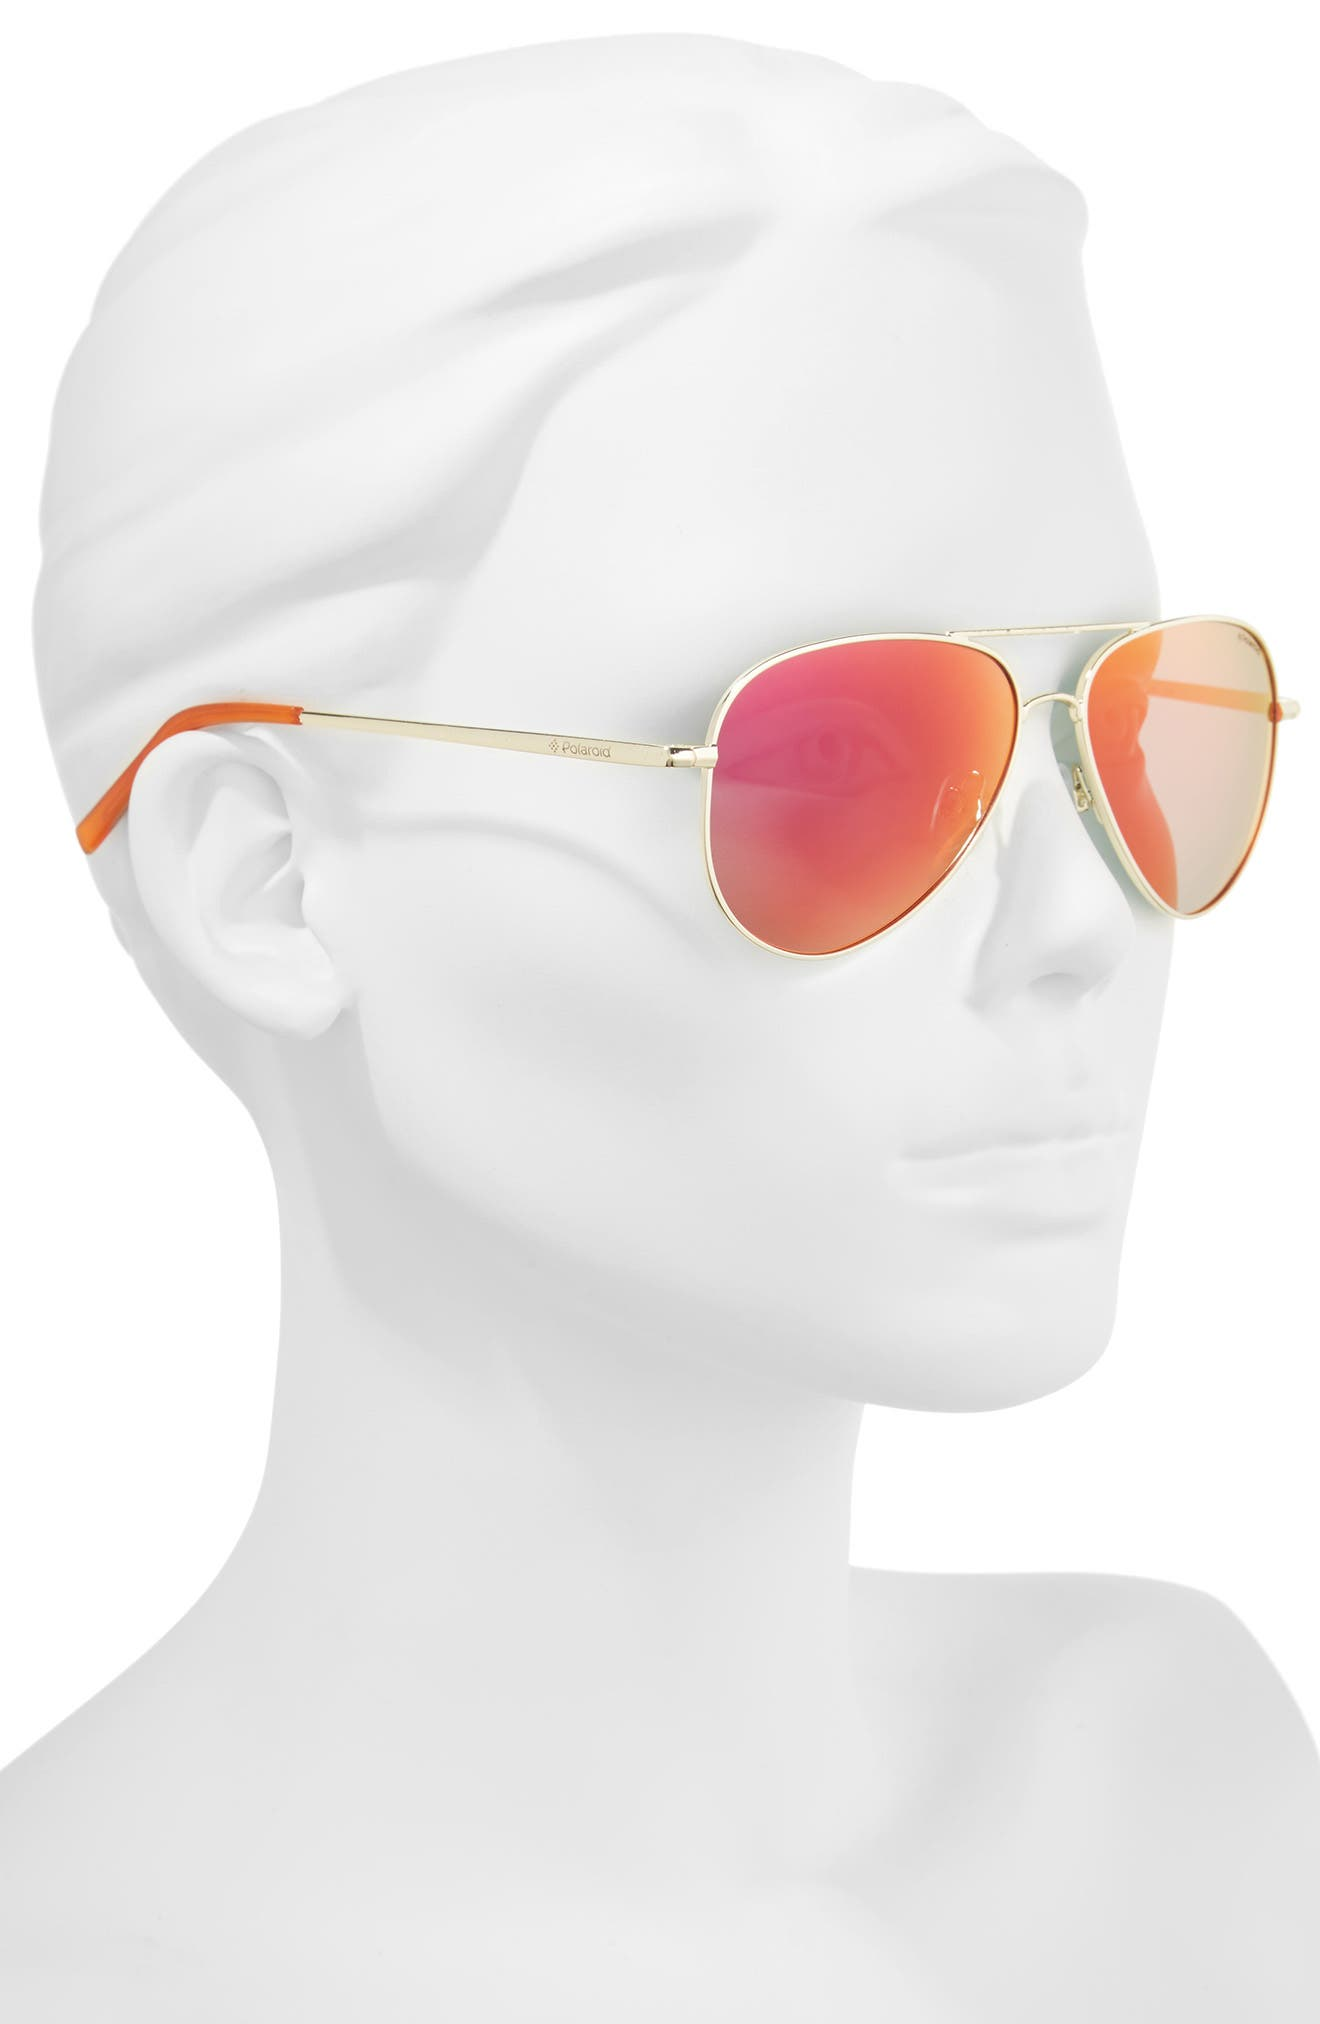 56mm Polarized Aviator Sunglasses,                             Alternate thumbnail 3, color,                             Gold/ Red Mirror